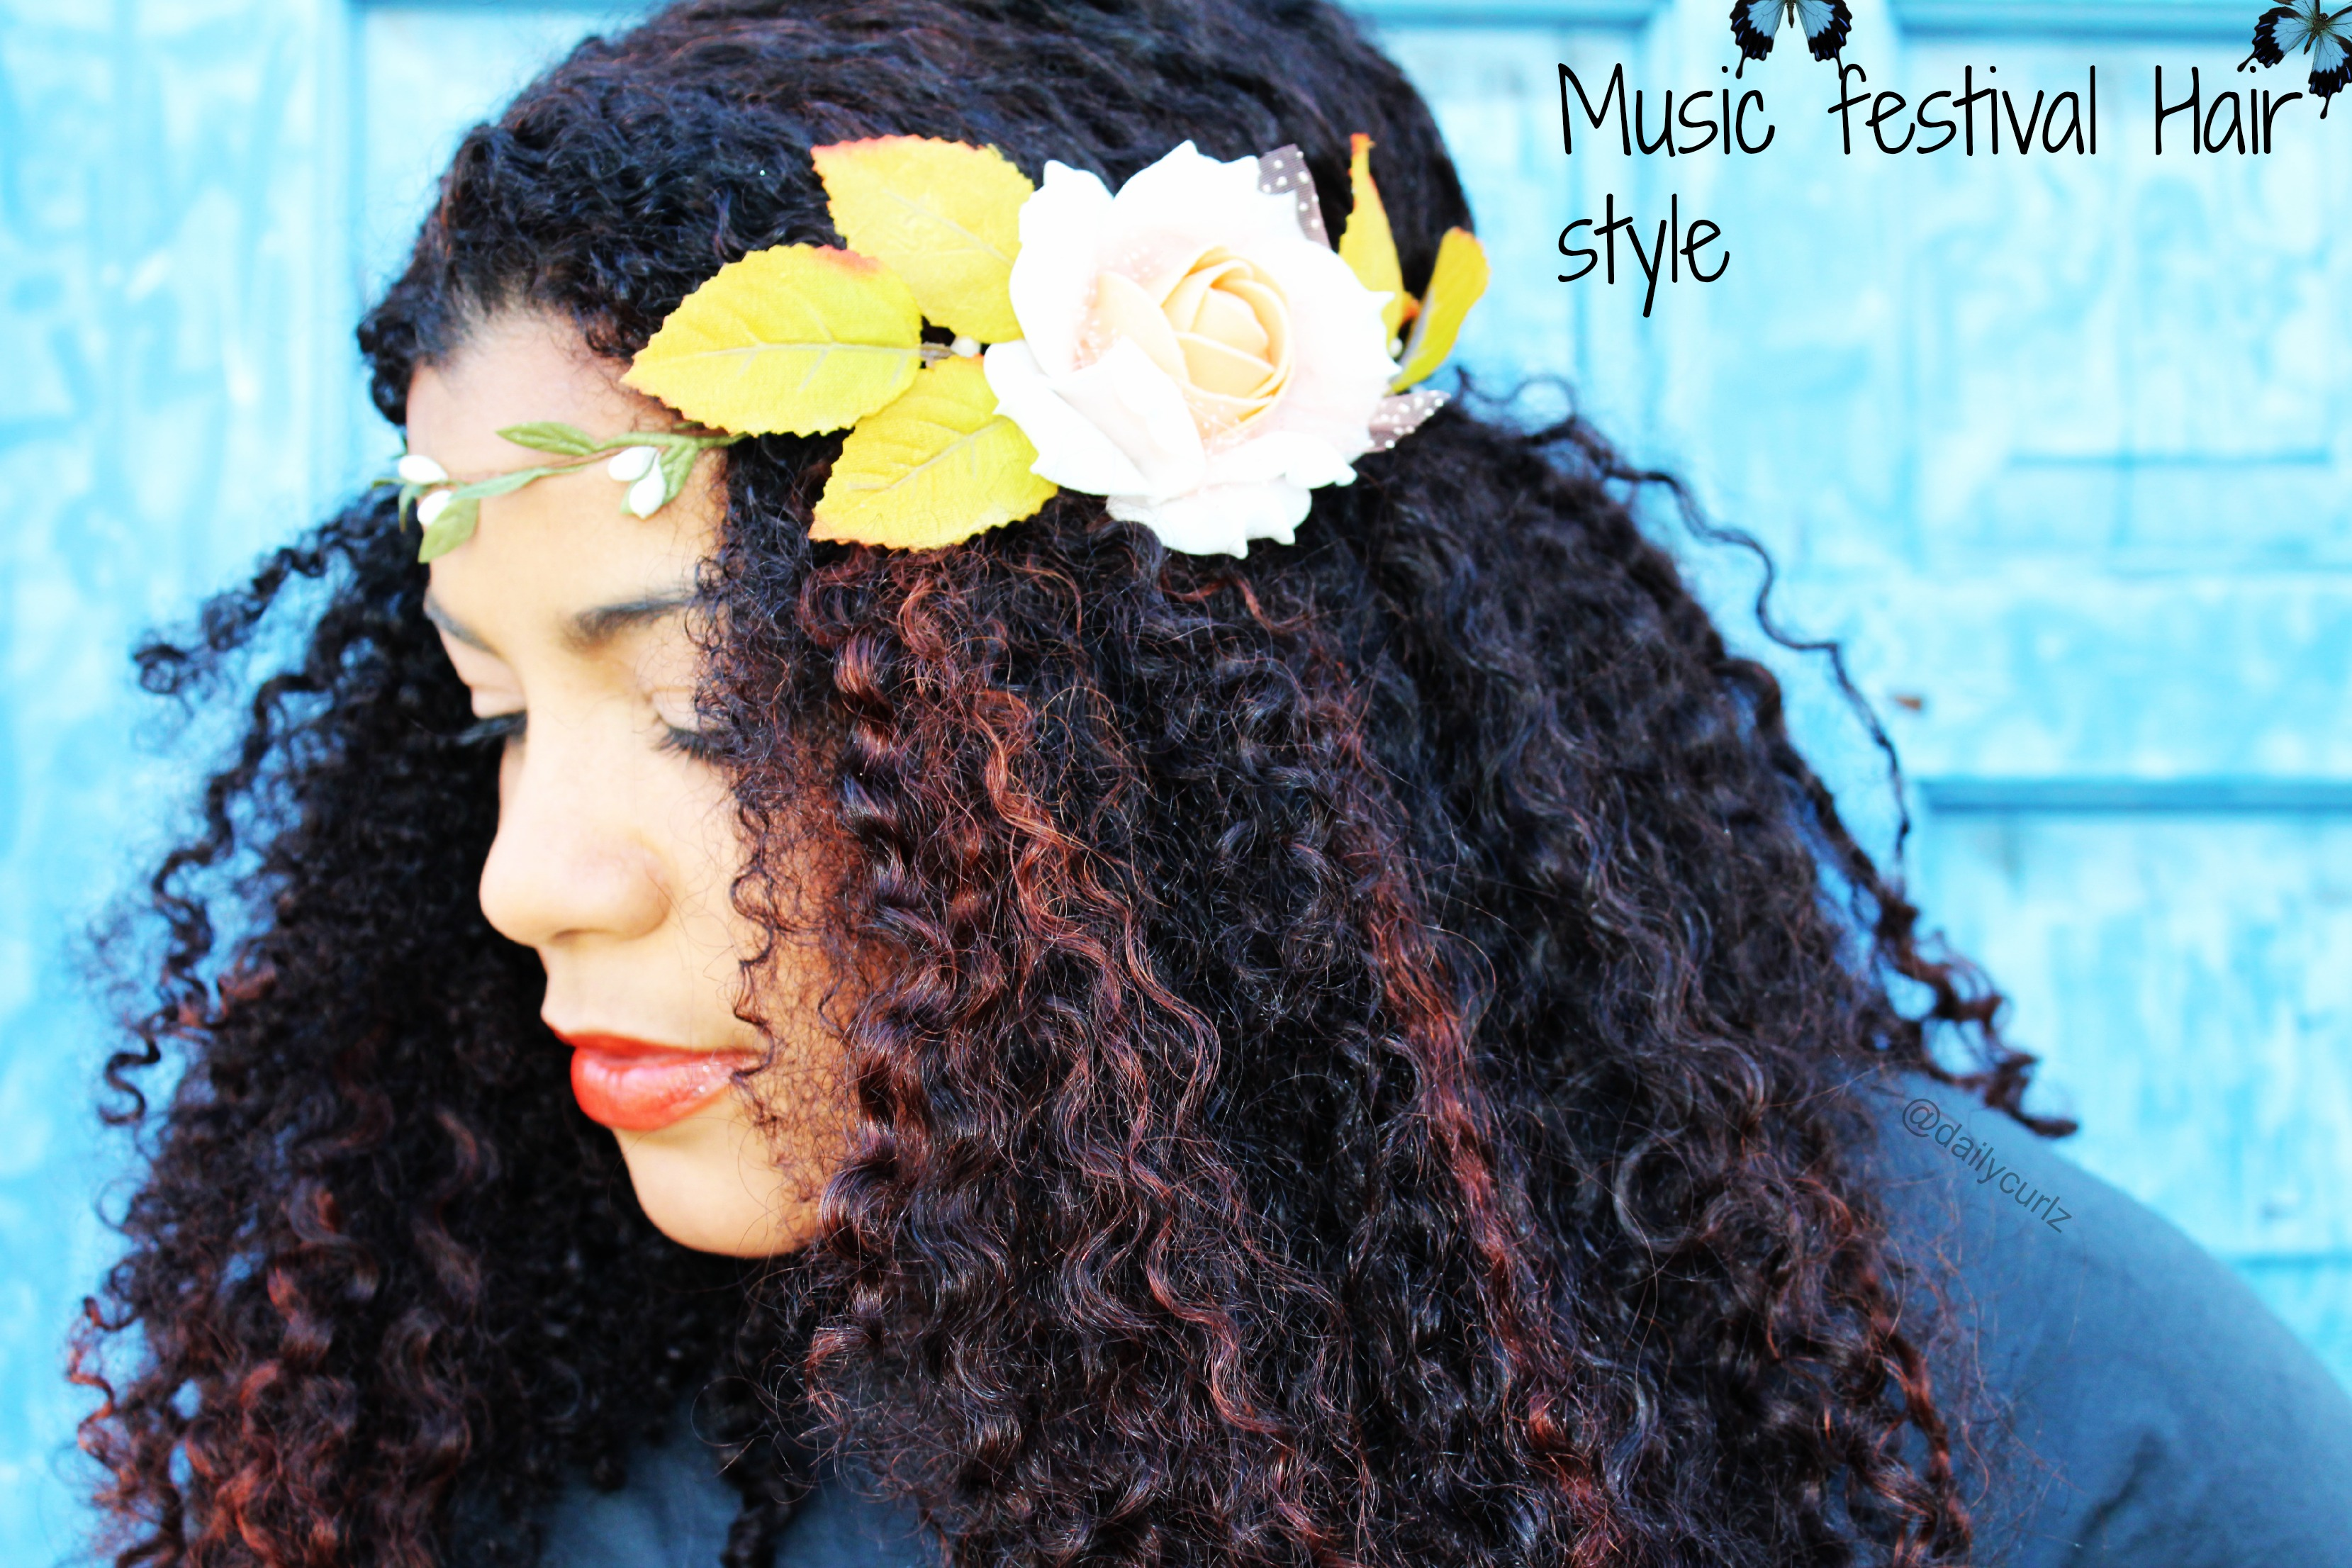 Music festival natural hair style / peinado inspirado en los festivales musicales